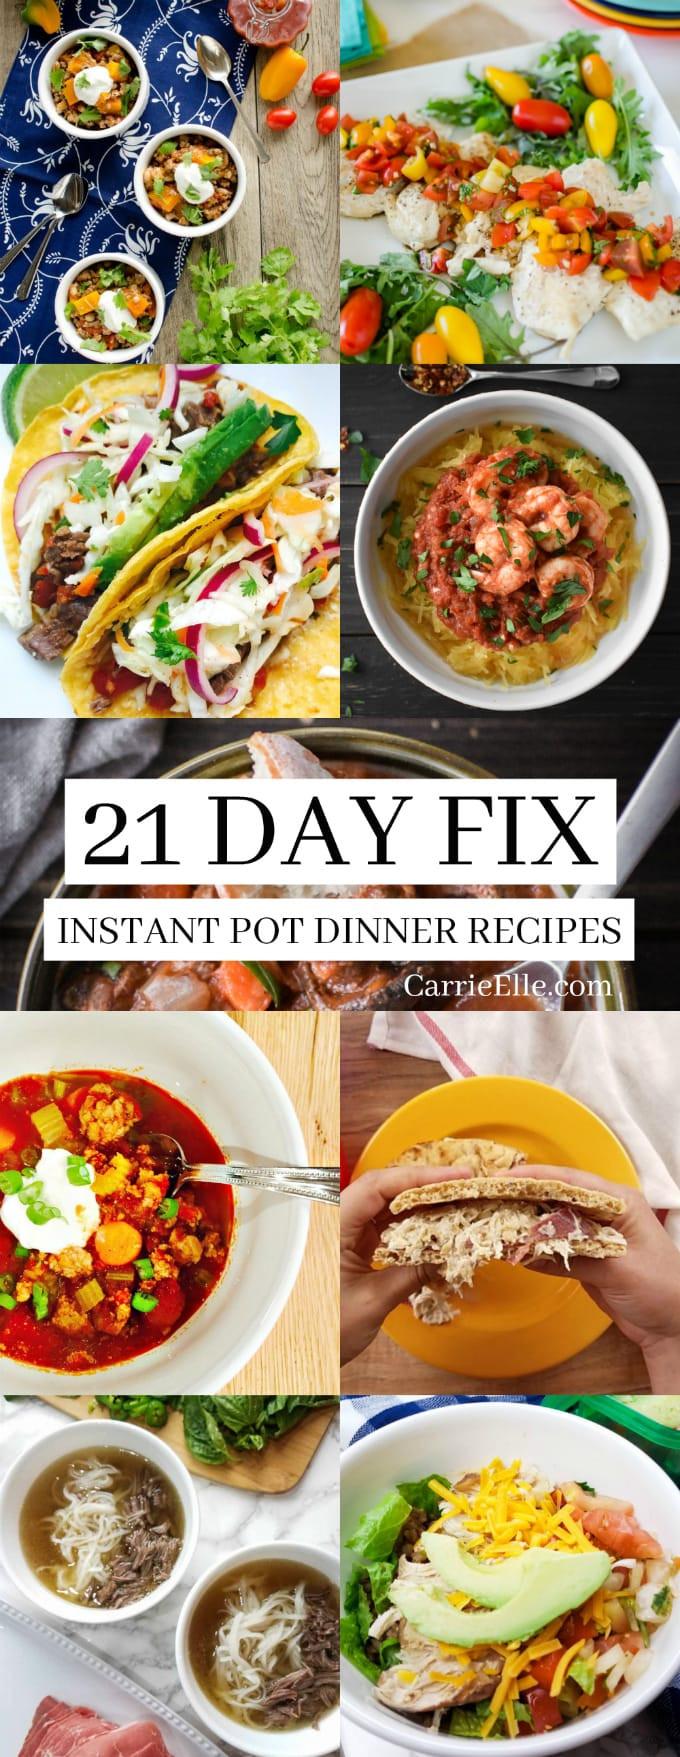 21 Day Fix Dinner Idea  21 Day Fix Instant Pot Dinner Recipes Carrie Elle